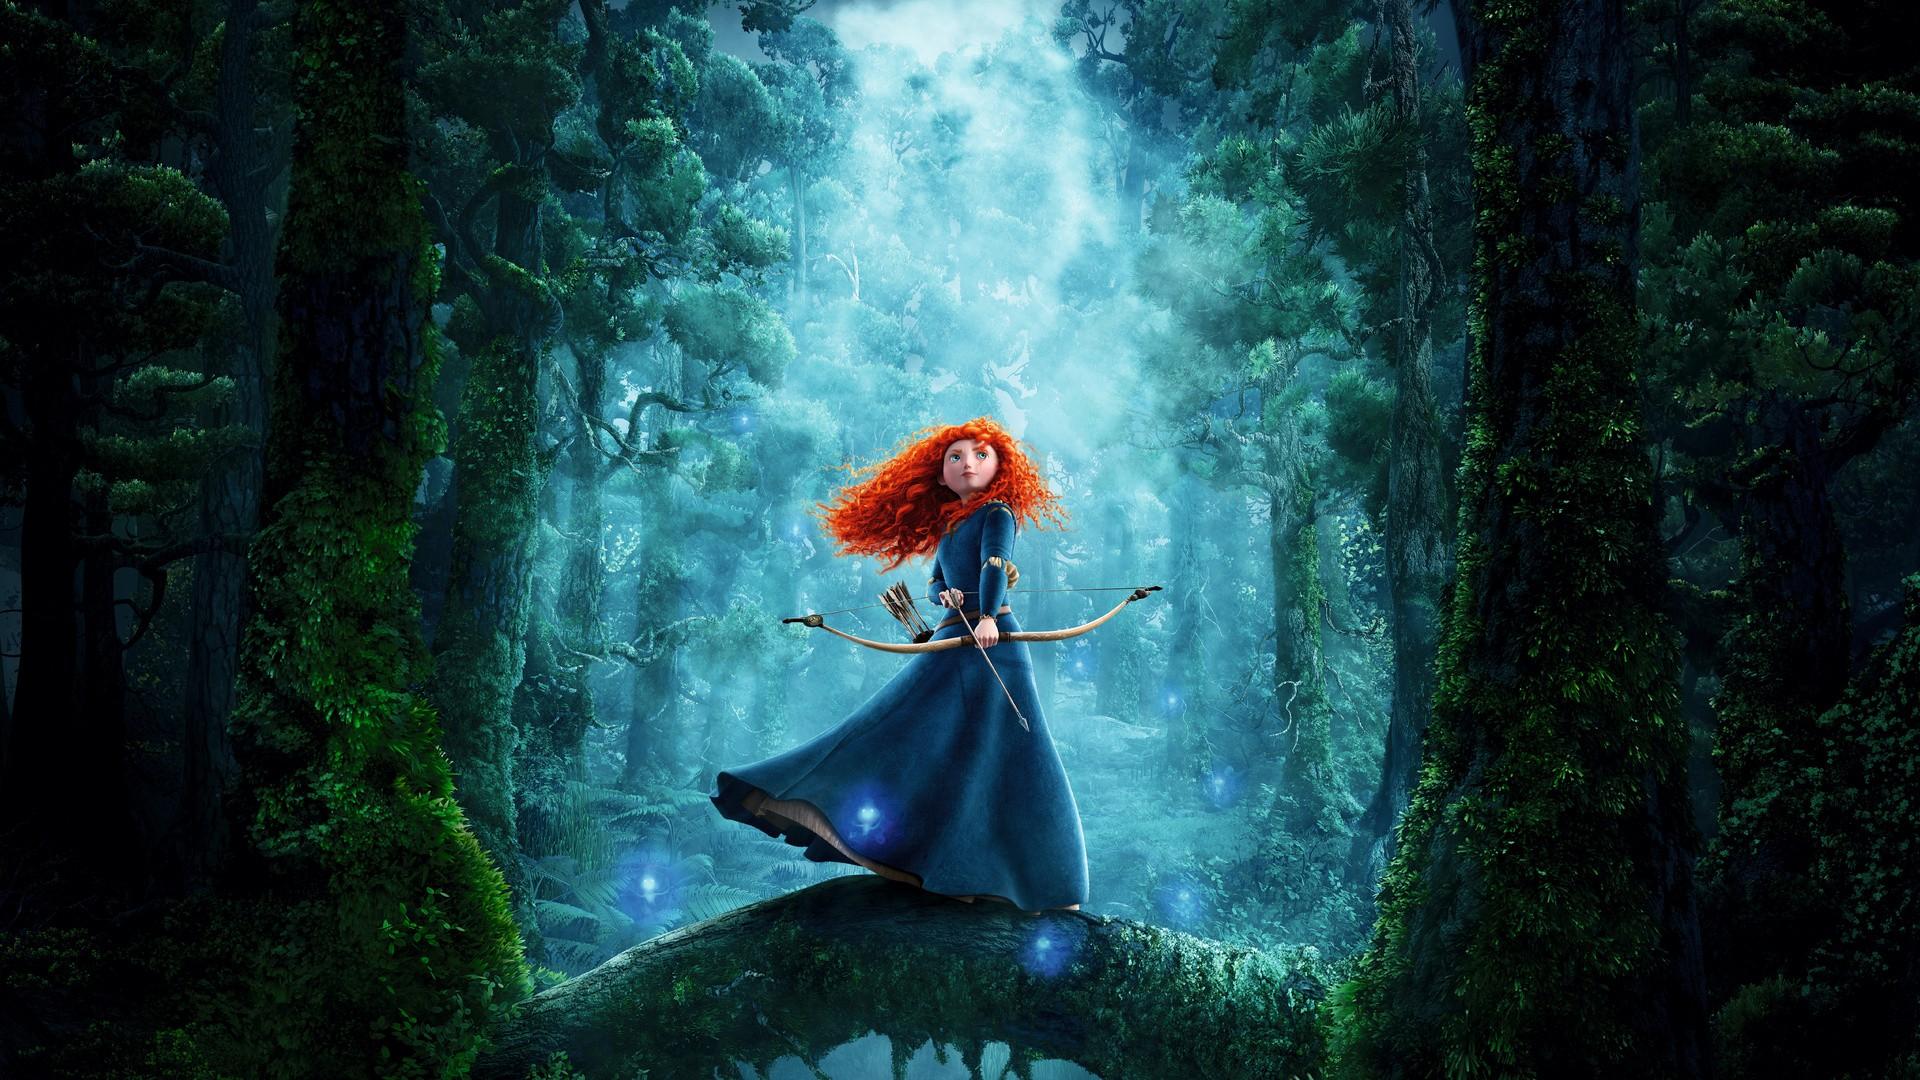 redhead disney brave